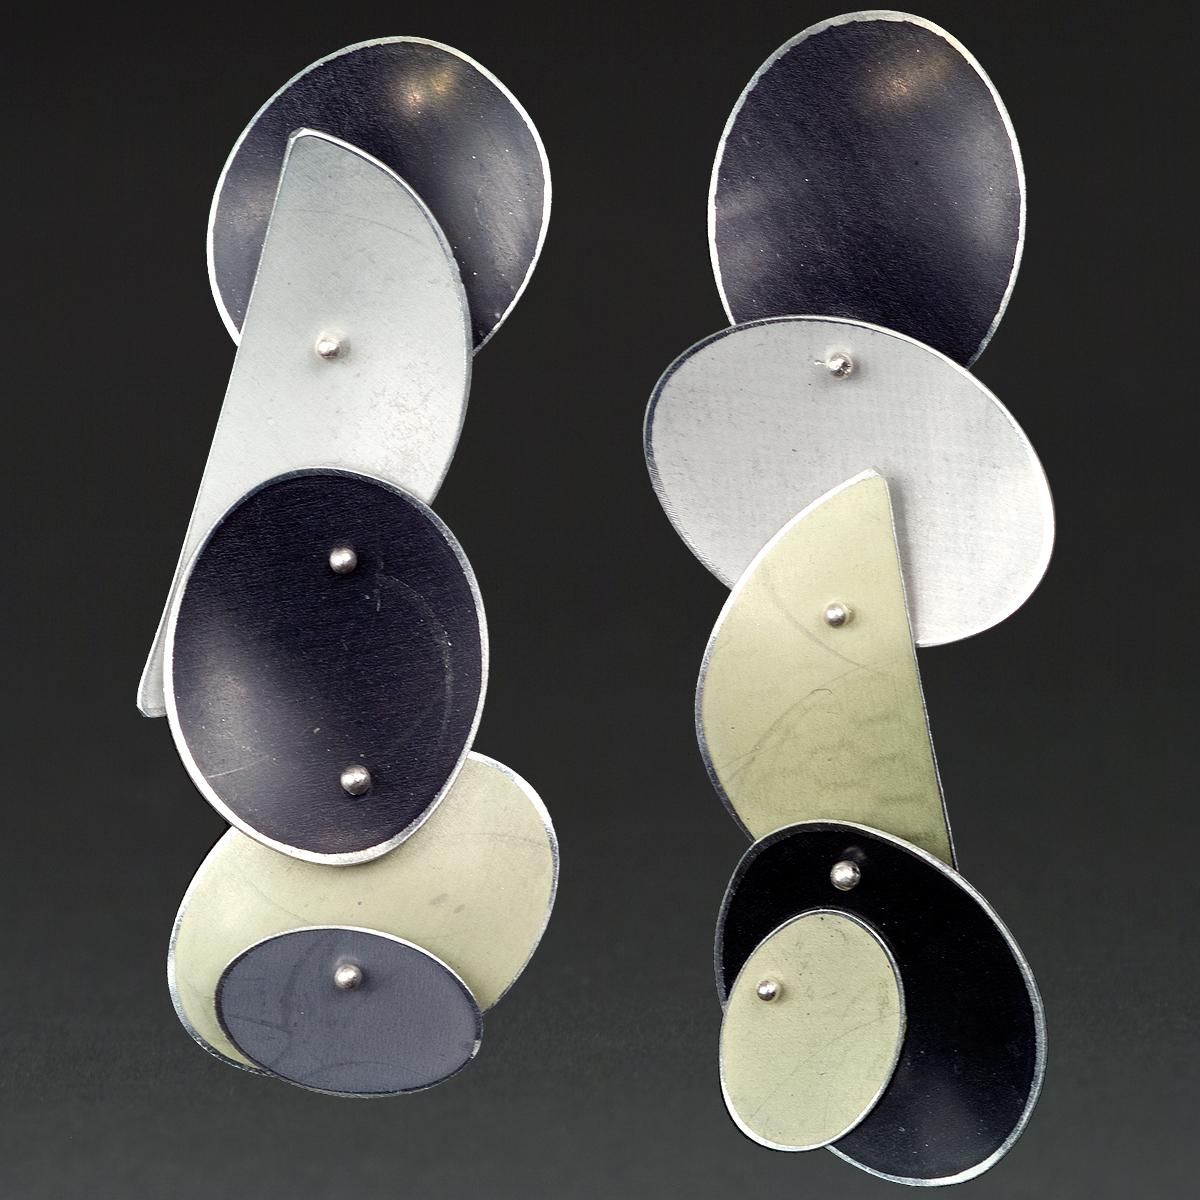 B - Black, Silver, Chablis, Grey